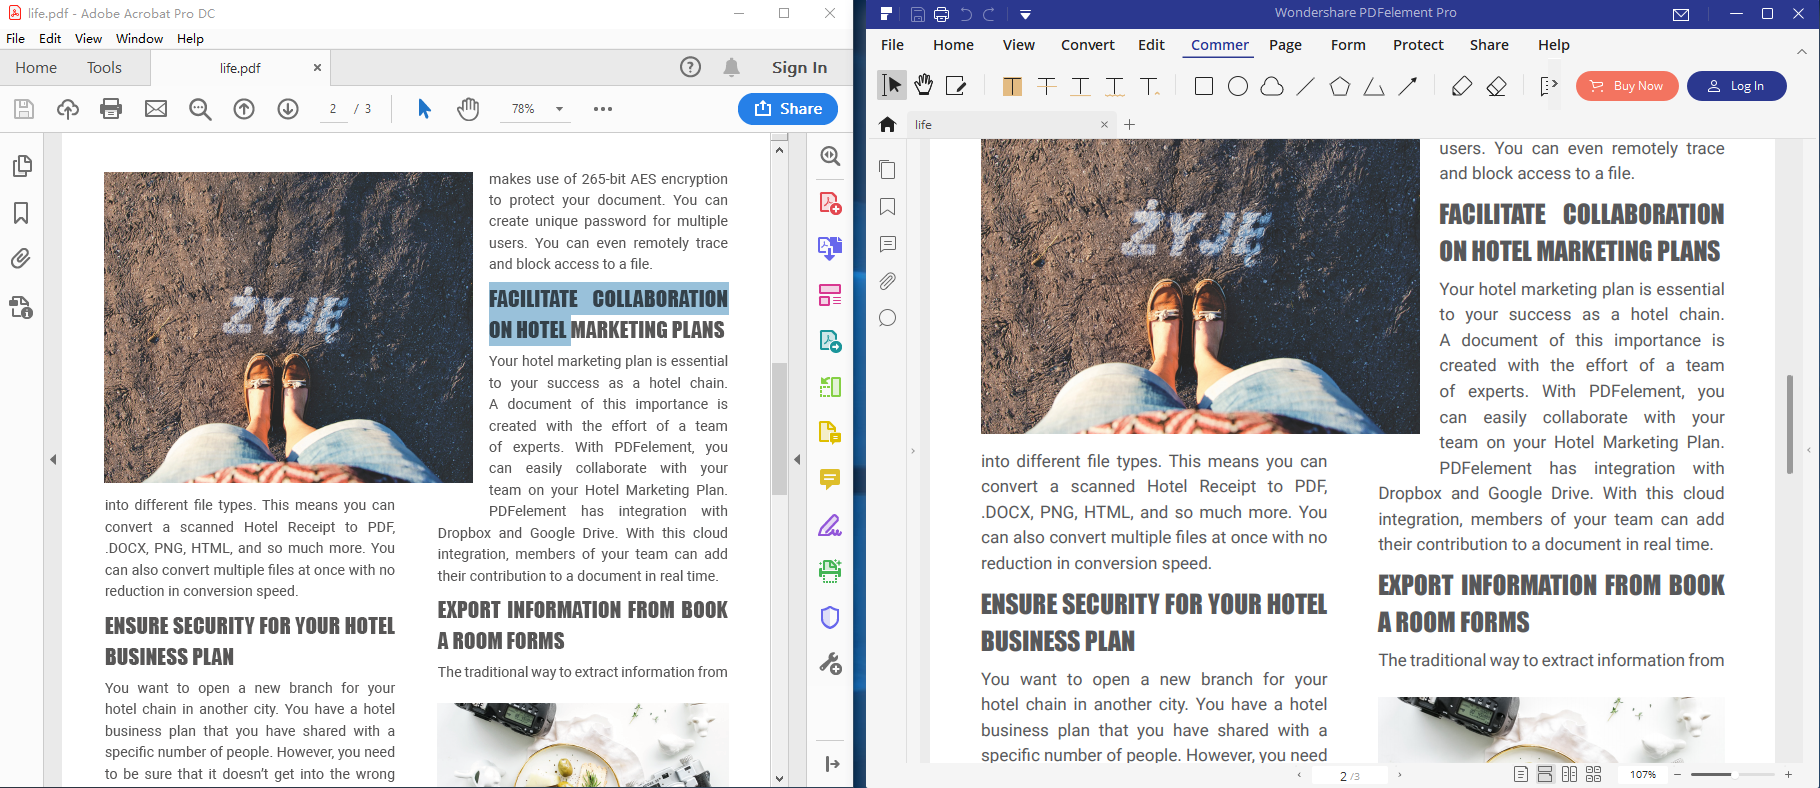 Displaying 3D models in PDFs, Adobe Acrobat